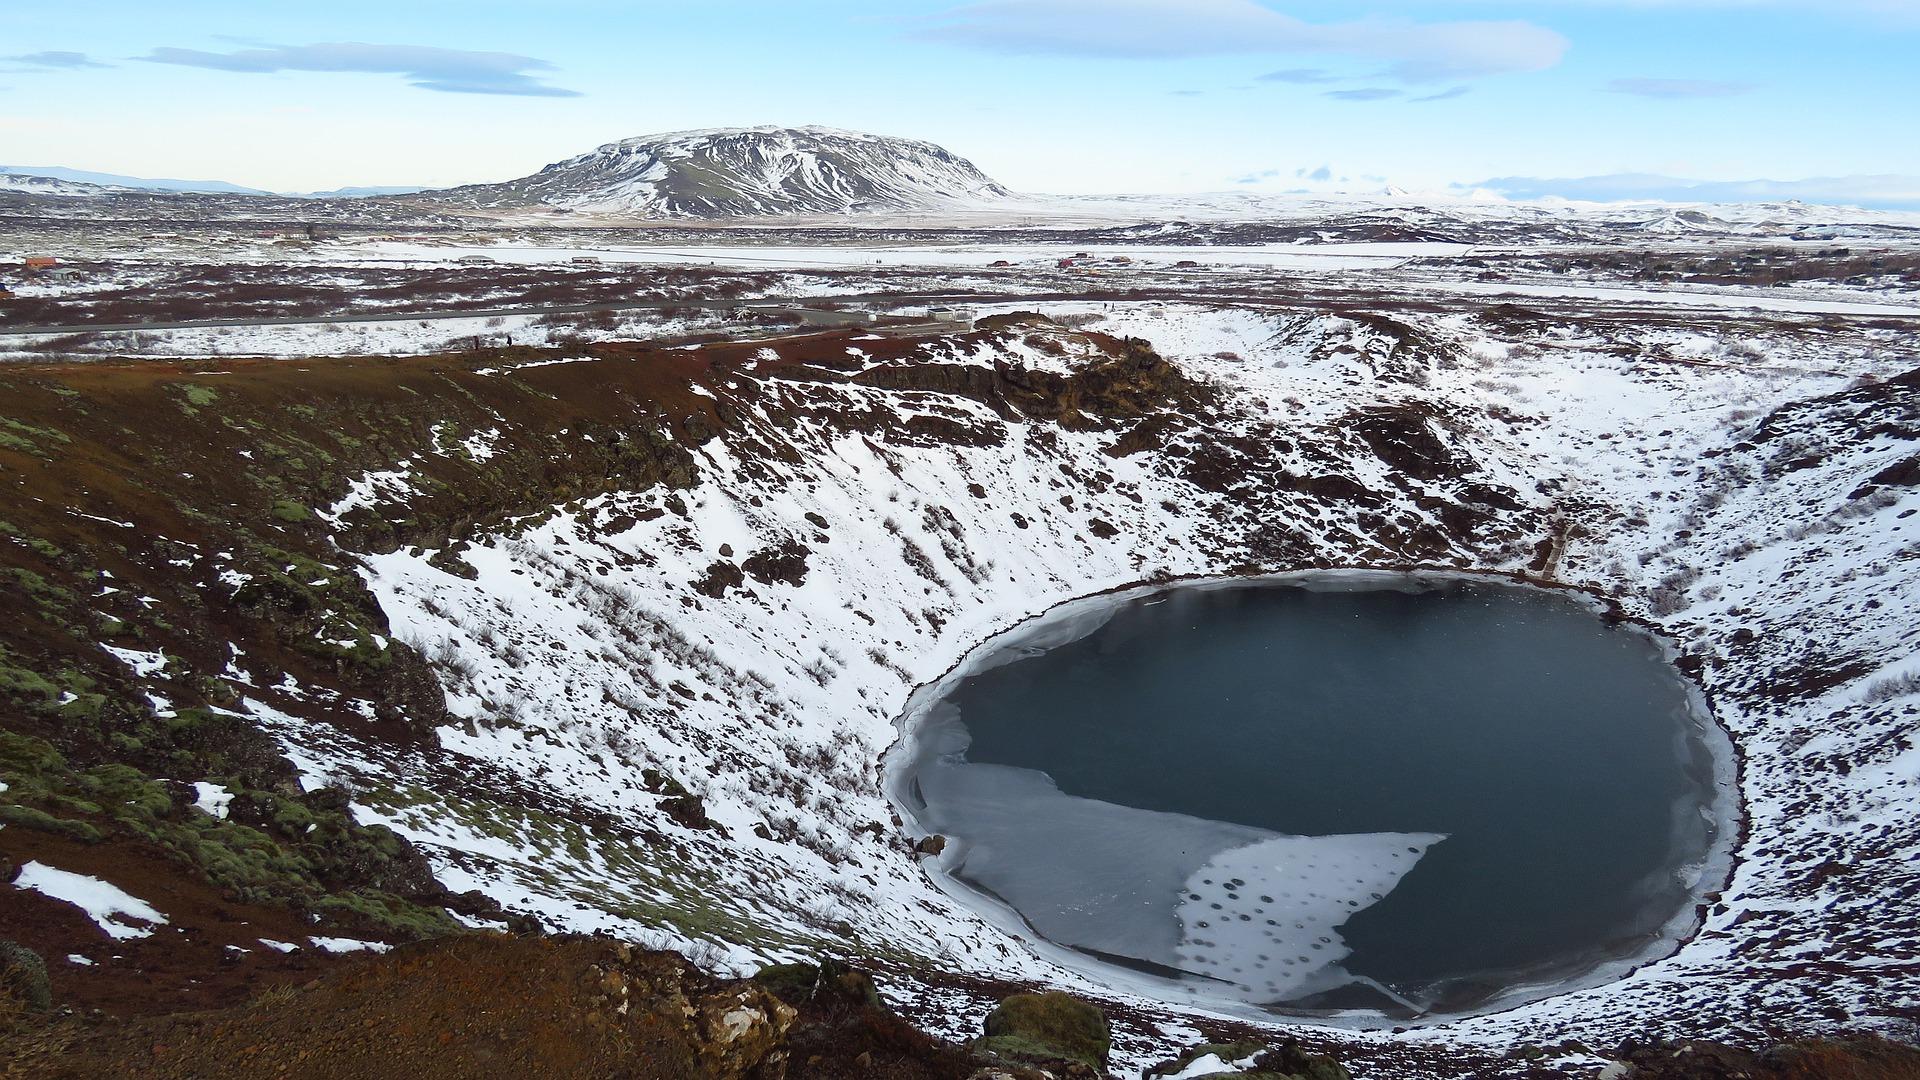 iceland-2889345_1920.jpg